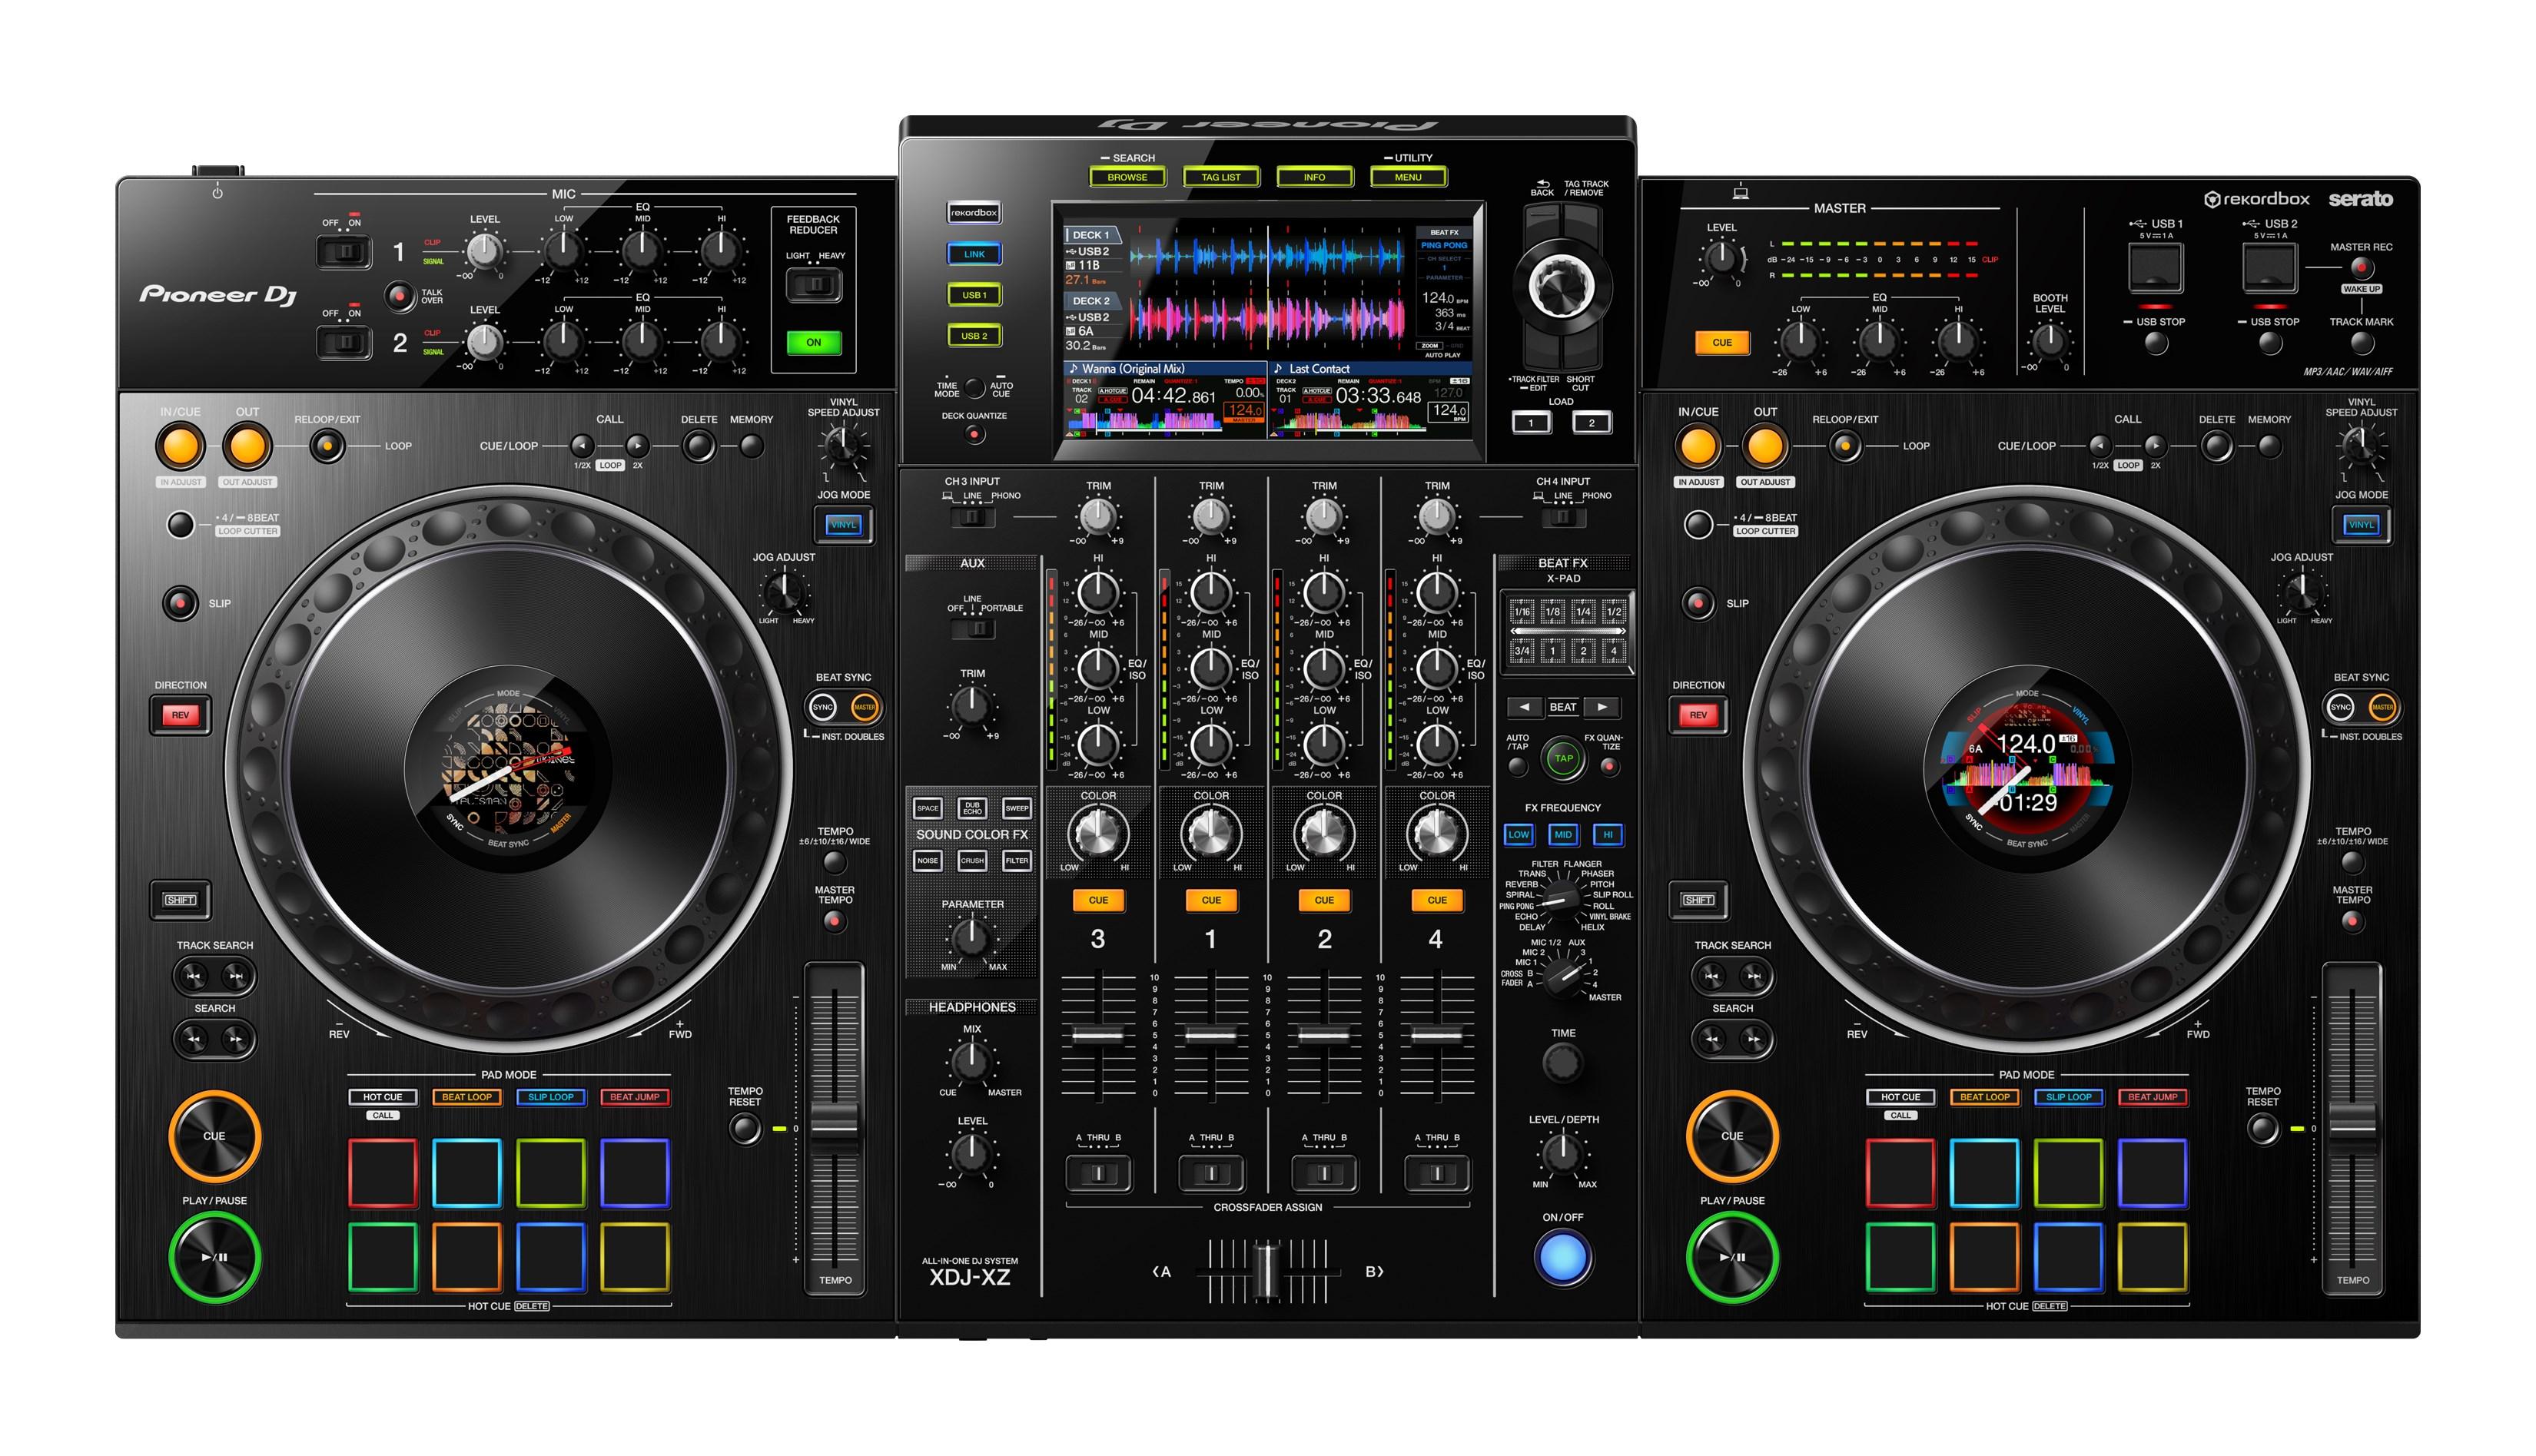 Pioneer(パイオニア) / XDJ-XZ 【rekordbox dj ライセンス付属】 - USBメモリー、rekordbox dj、Serato DJ、iPhone、Android 対応 DJコントローラー -